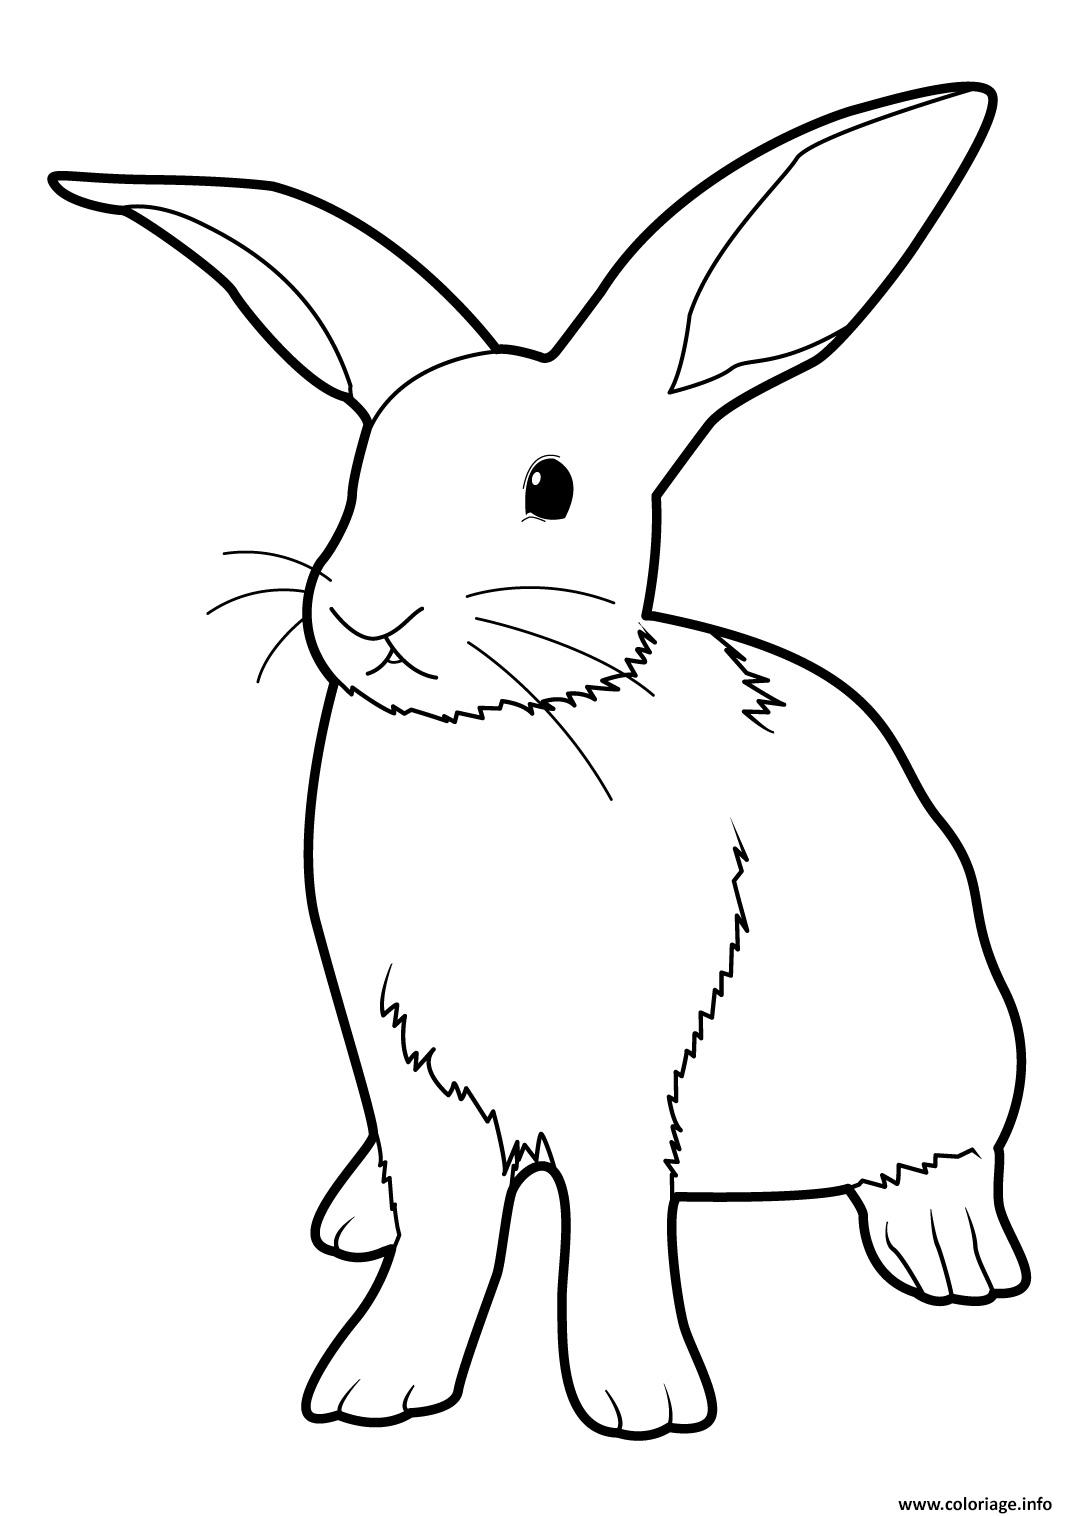 Coloriage lapin realiste debout dessin - Un lapin dessin ...